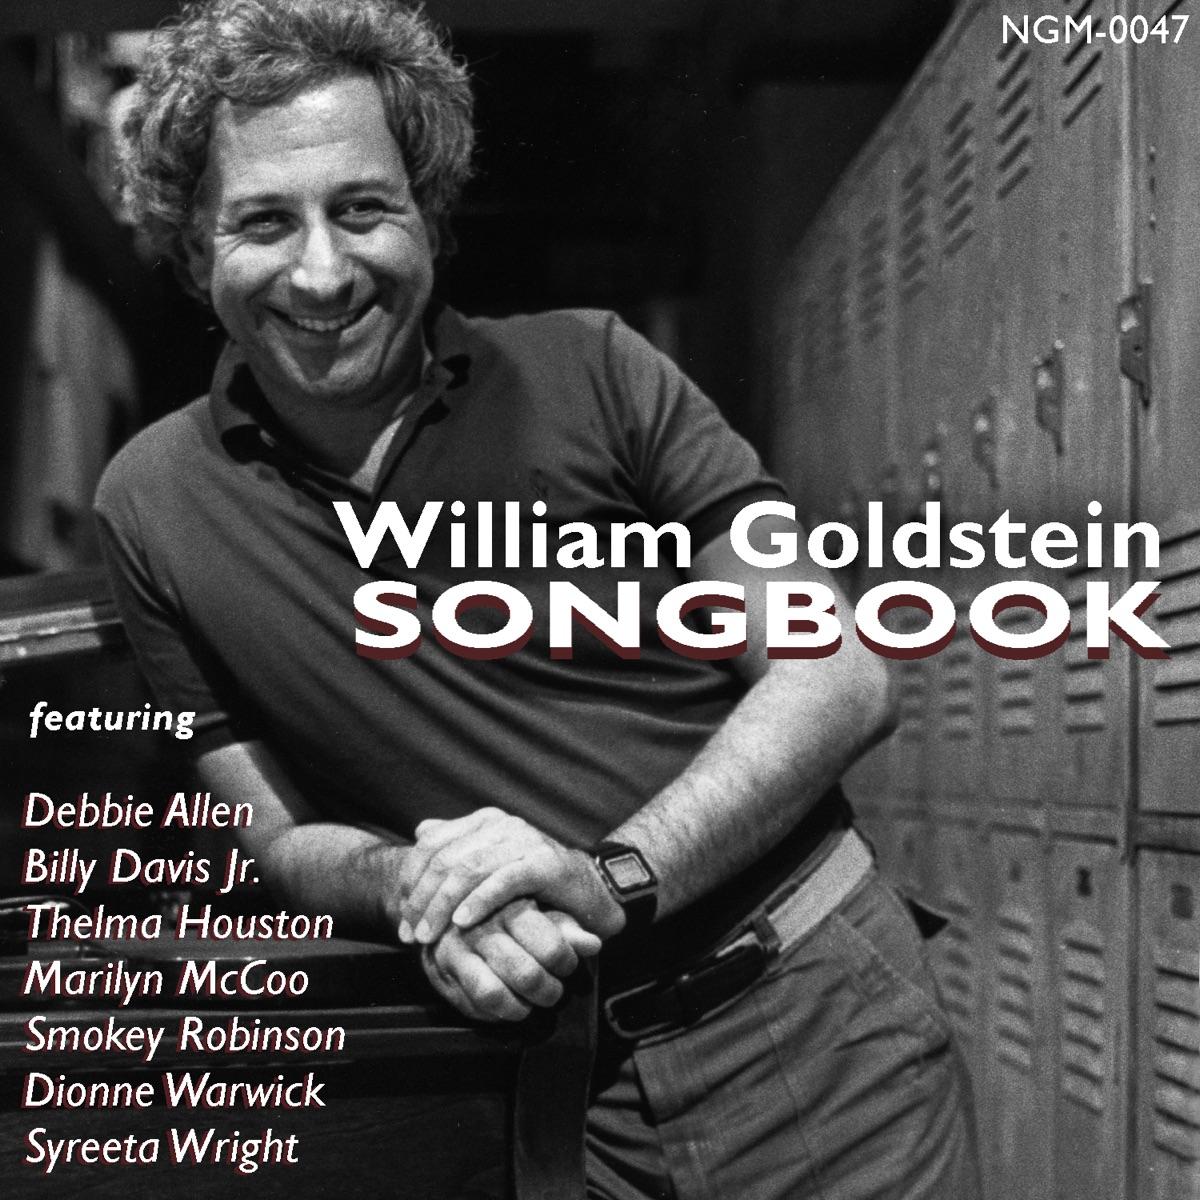 Songbook feat Smokey Robinson Thelma Huston Debbie Allen Vesta Williams Marilyn McCoo Jason Cane Dionne Warwick  Billy Davis Jr Various Artists CD cover